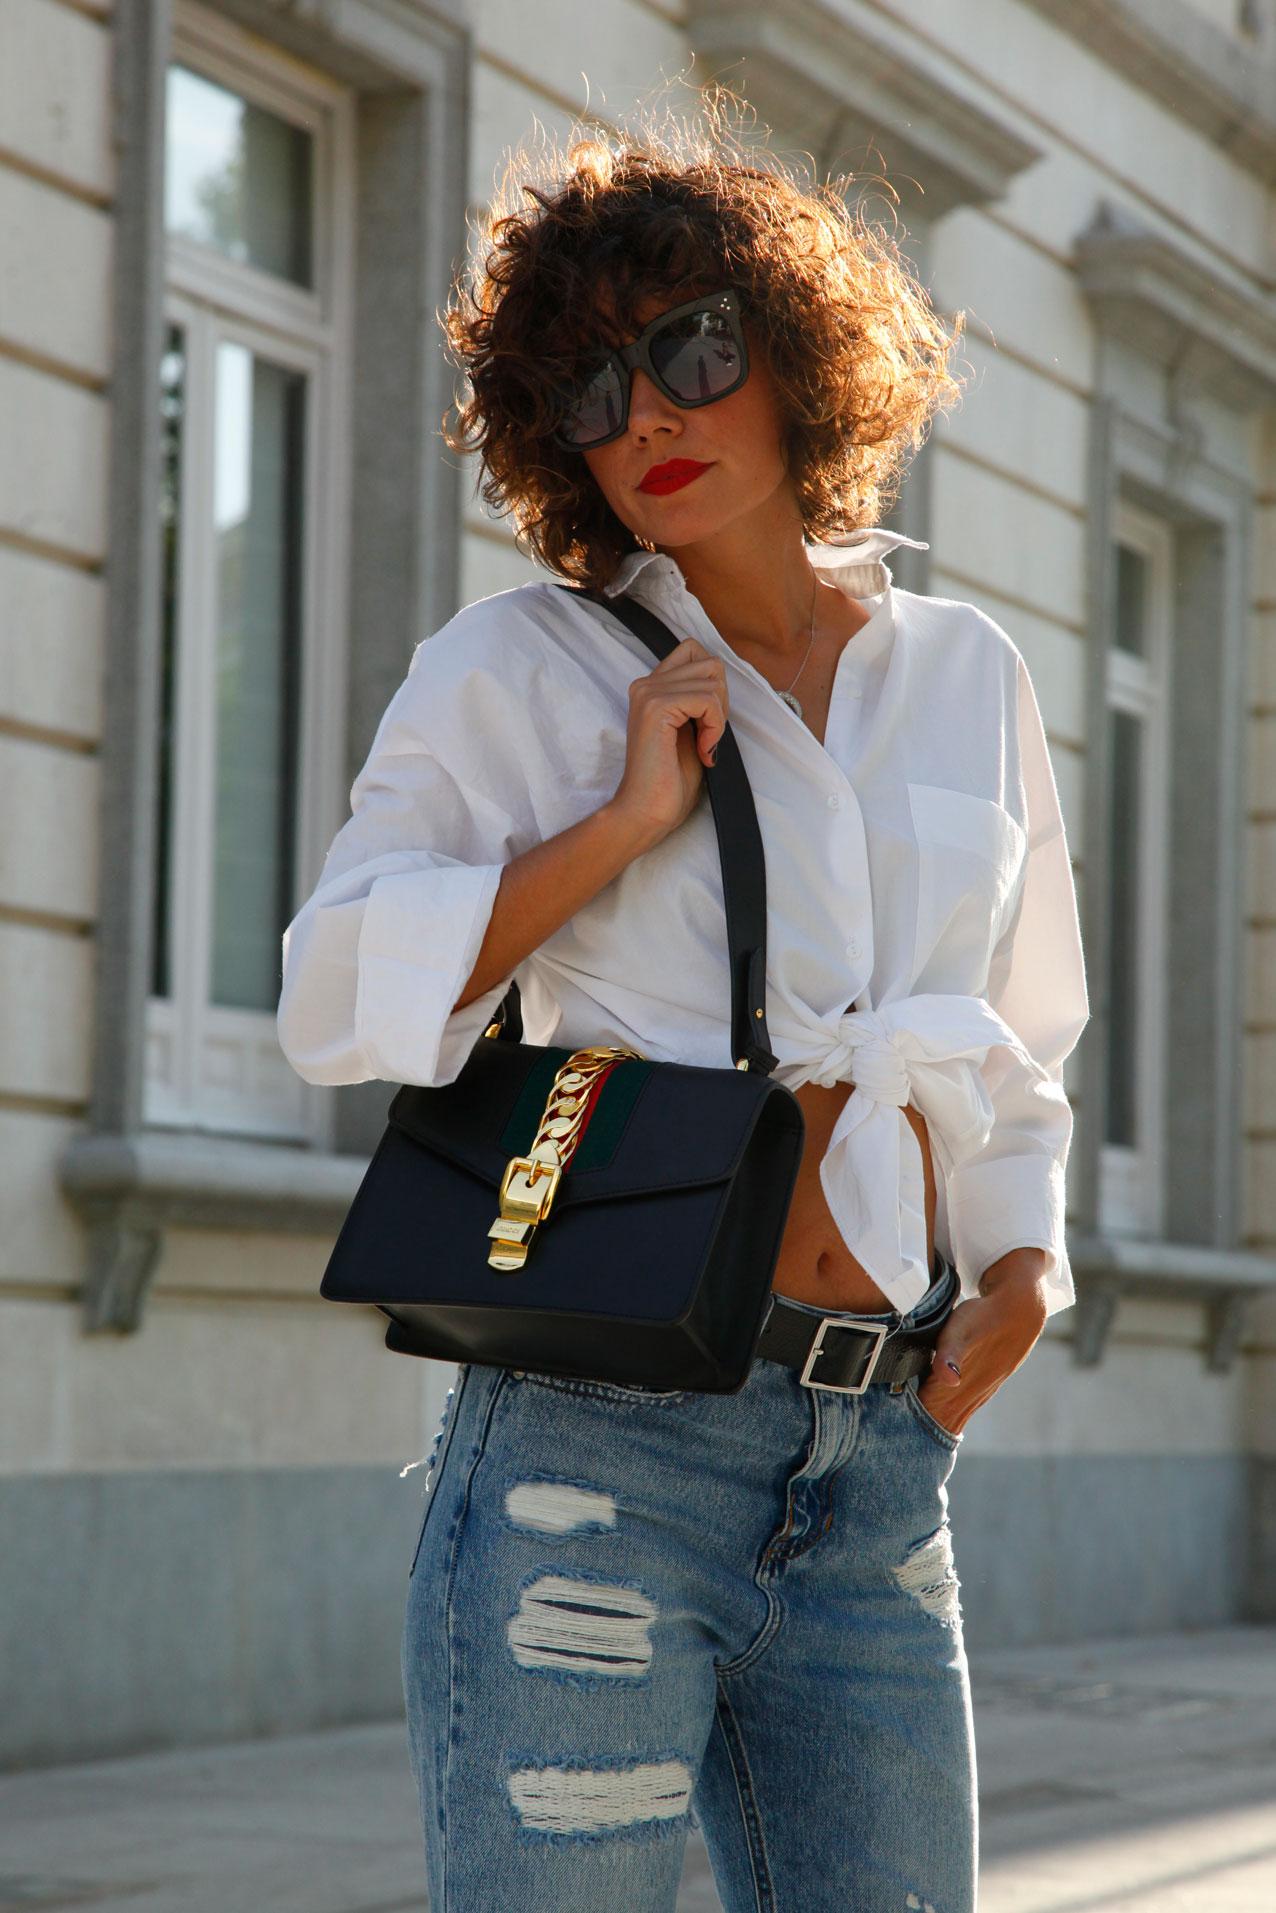 shirt_and_jeans-steetstyle-gucci-sylvie_bag-cool_lemonade